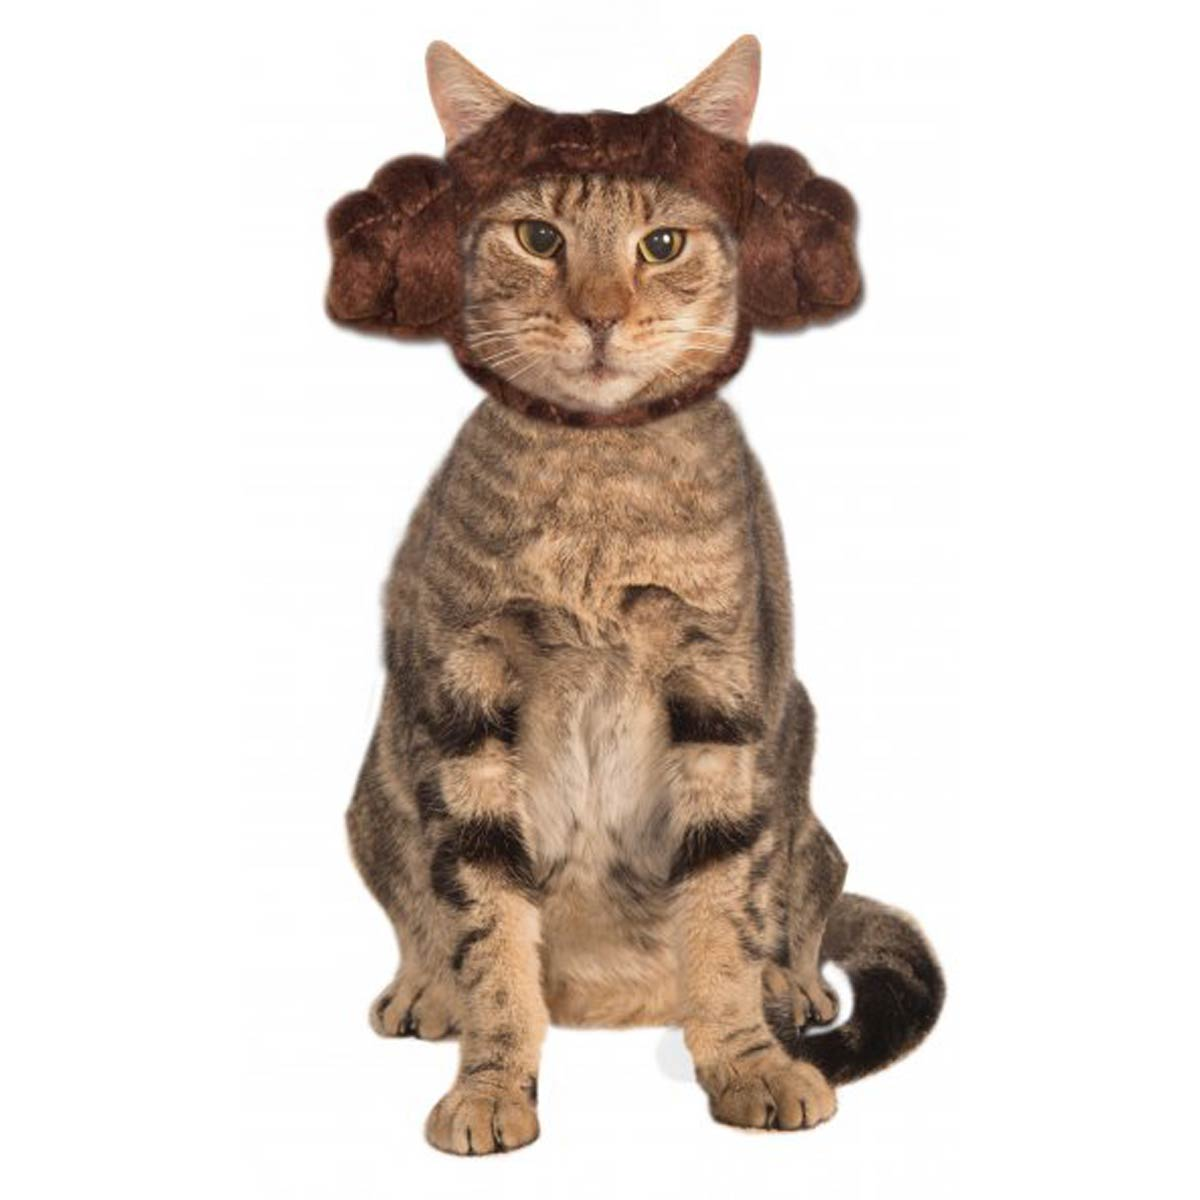 Star Wars Princess Leia Hood Cat Costume